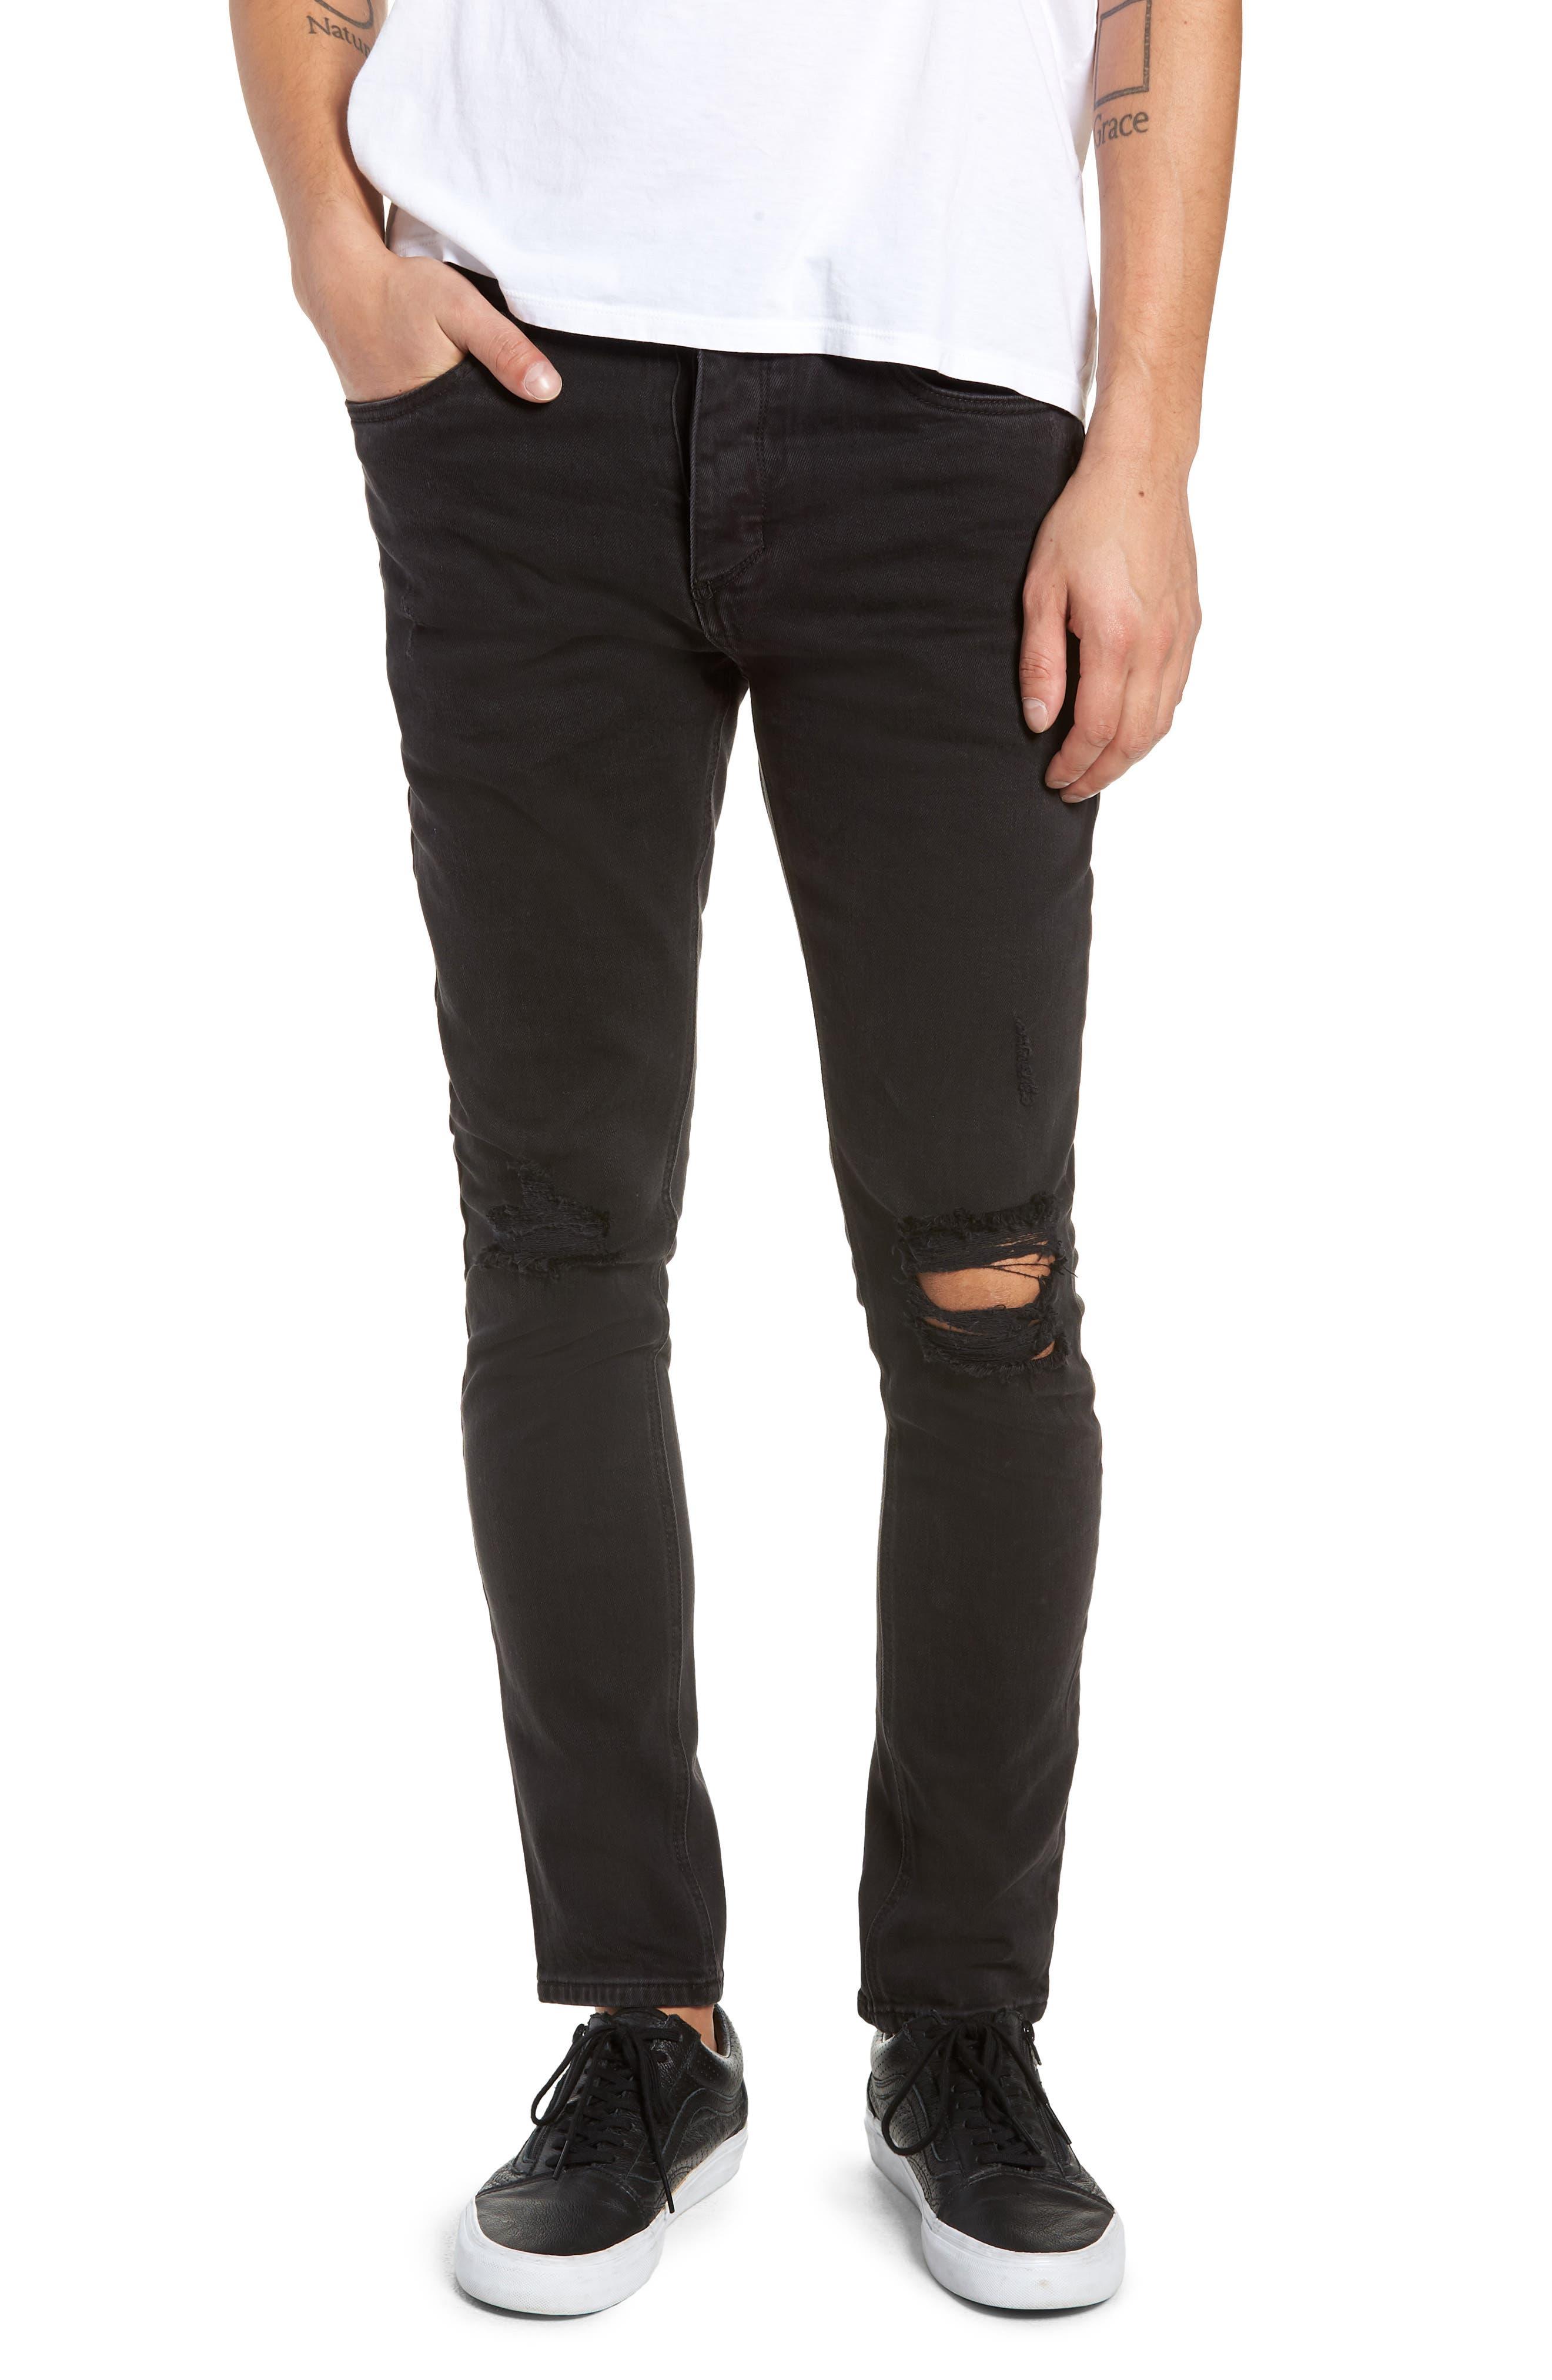 Joe Blow Slim Fit Jeans,                         Main,                         color, BUSTED BLACK